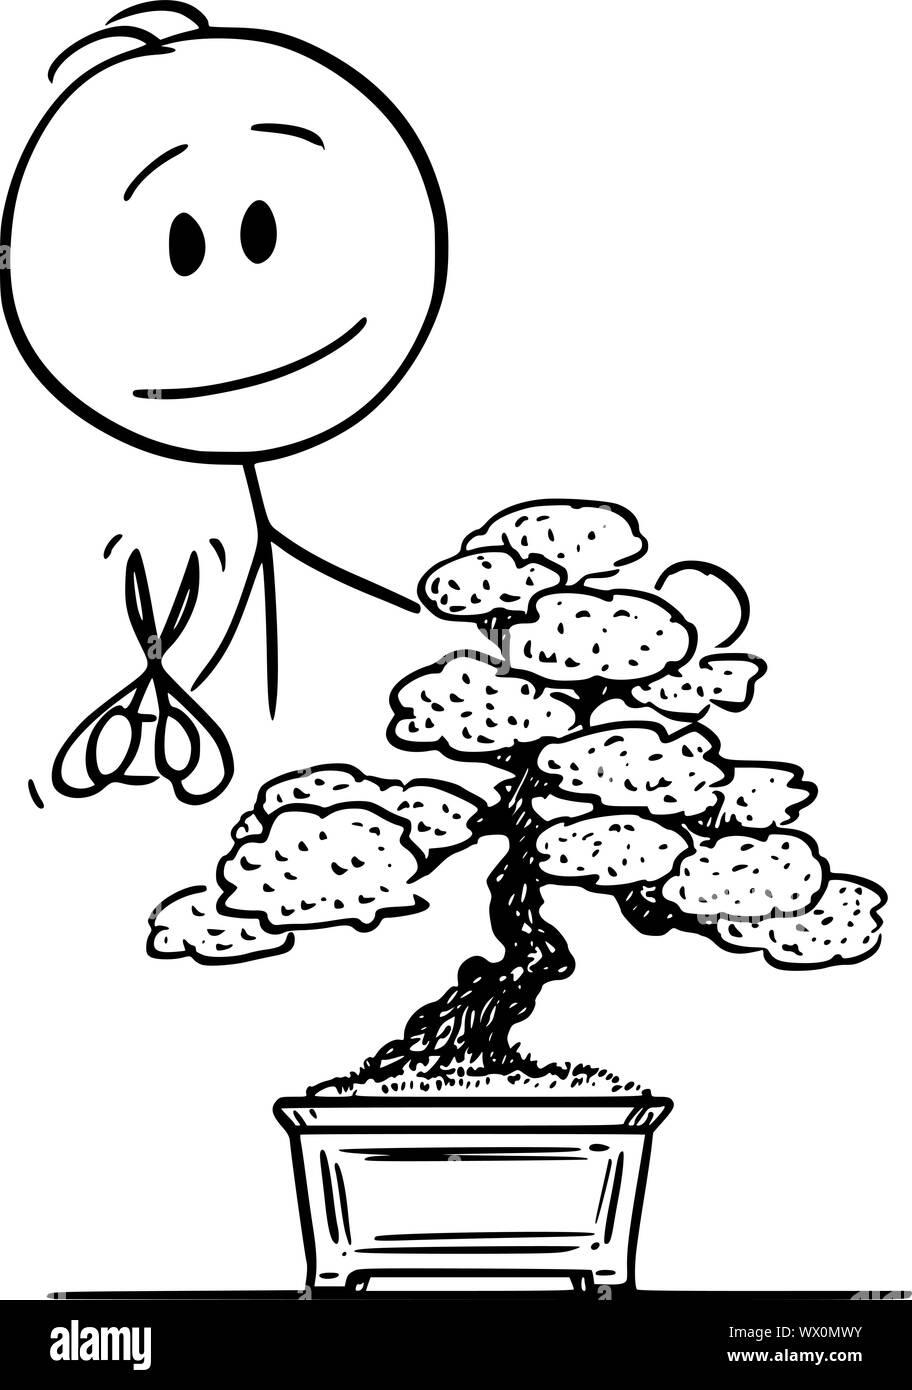 Vector Cartoon Stick Figure Drawing Conceptual Illustration Of Man Pruning Bonsai Tree Stock Vector Image Art Alamy